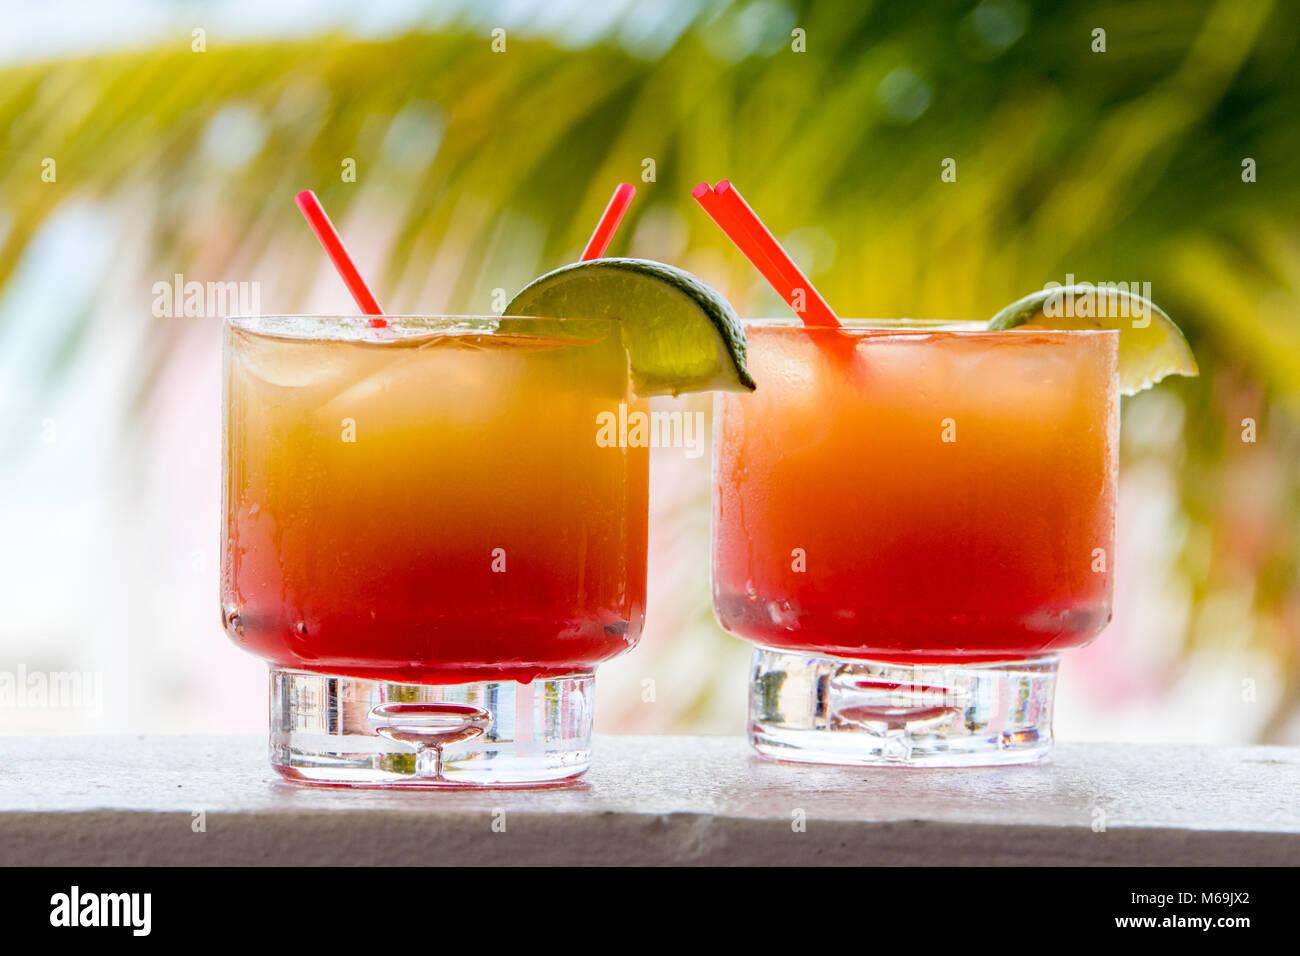 Tropical Rum Punch Stockfotos & Tropical Rum Punch Bilder - Alamy